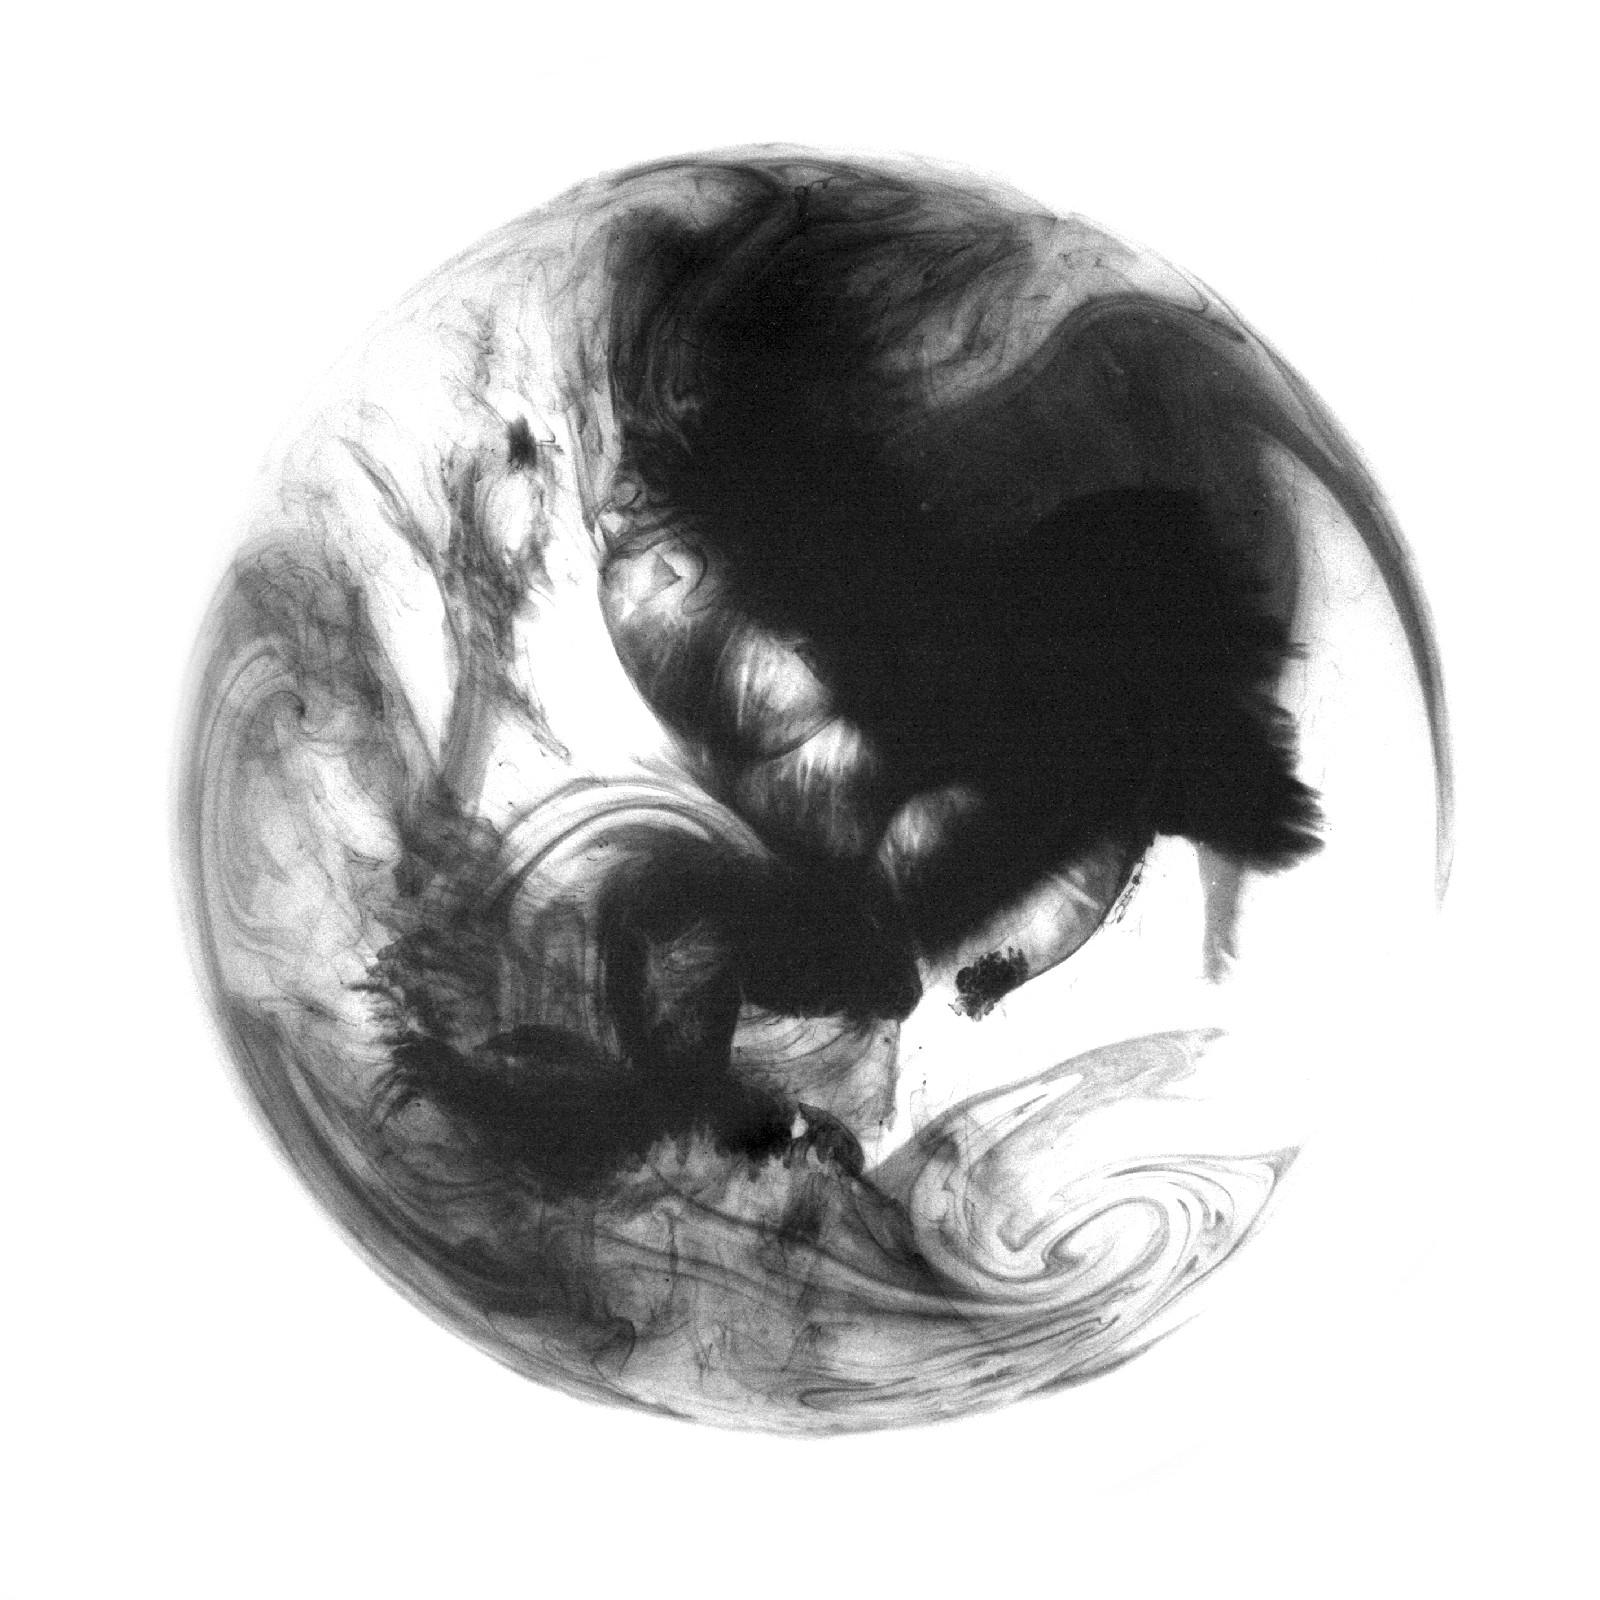 ps古风免抠水墨素材图片